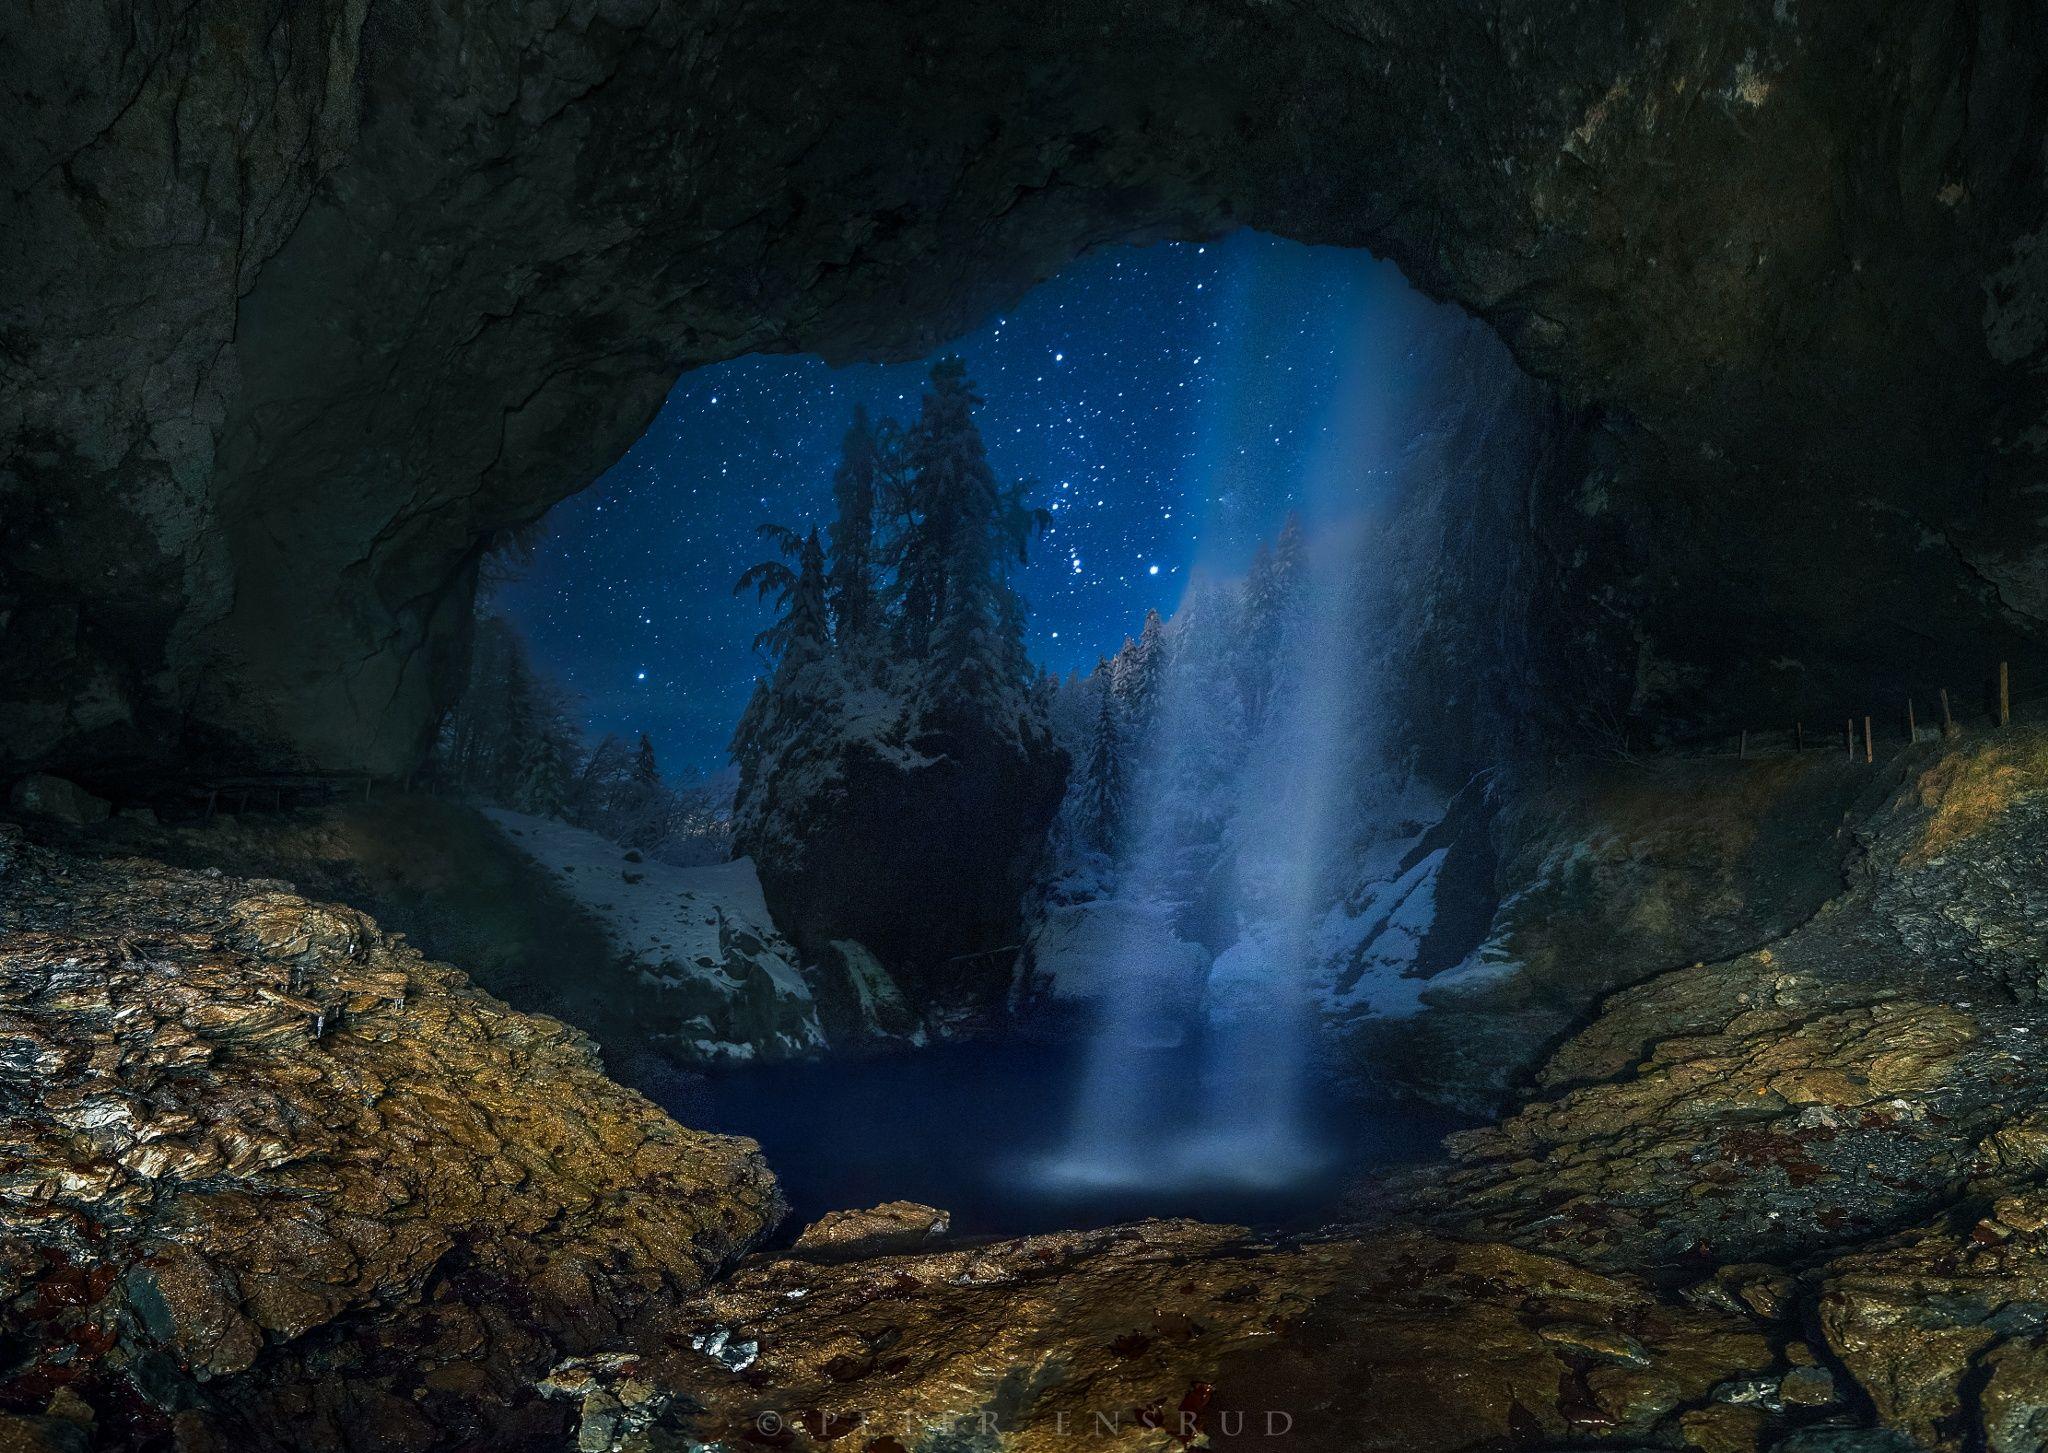 Berglistüber Cave by Peter Ensrud on 500px.... #alps #astrophotography #cave #glarus #light painting #linthal #long exposure #longexposure #night #night photography #nightscape #panorama #snow #stars #switzerland #waterfall #Unesco #swiss #sardona